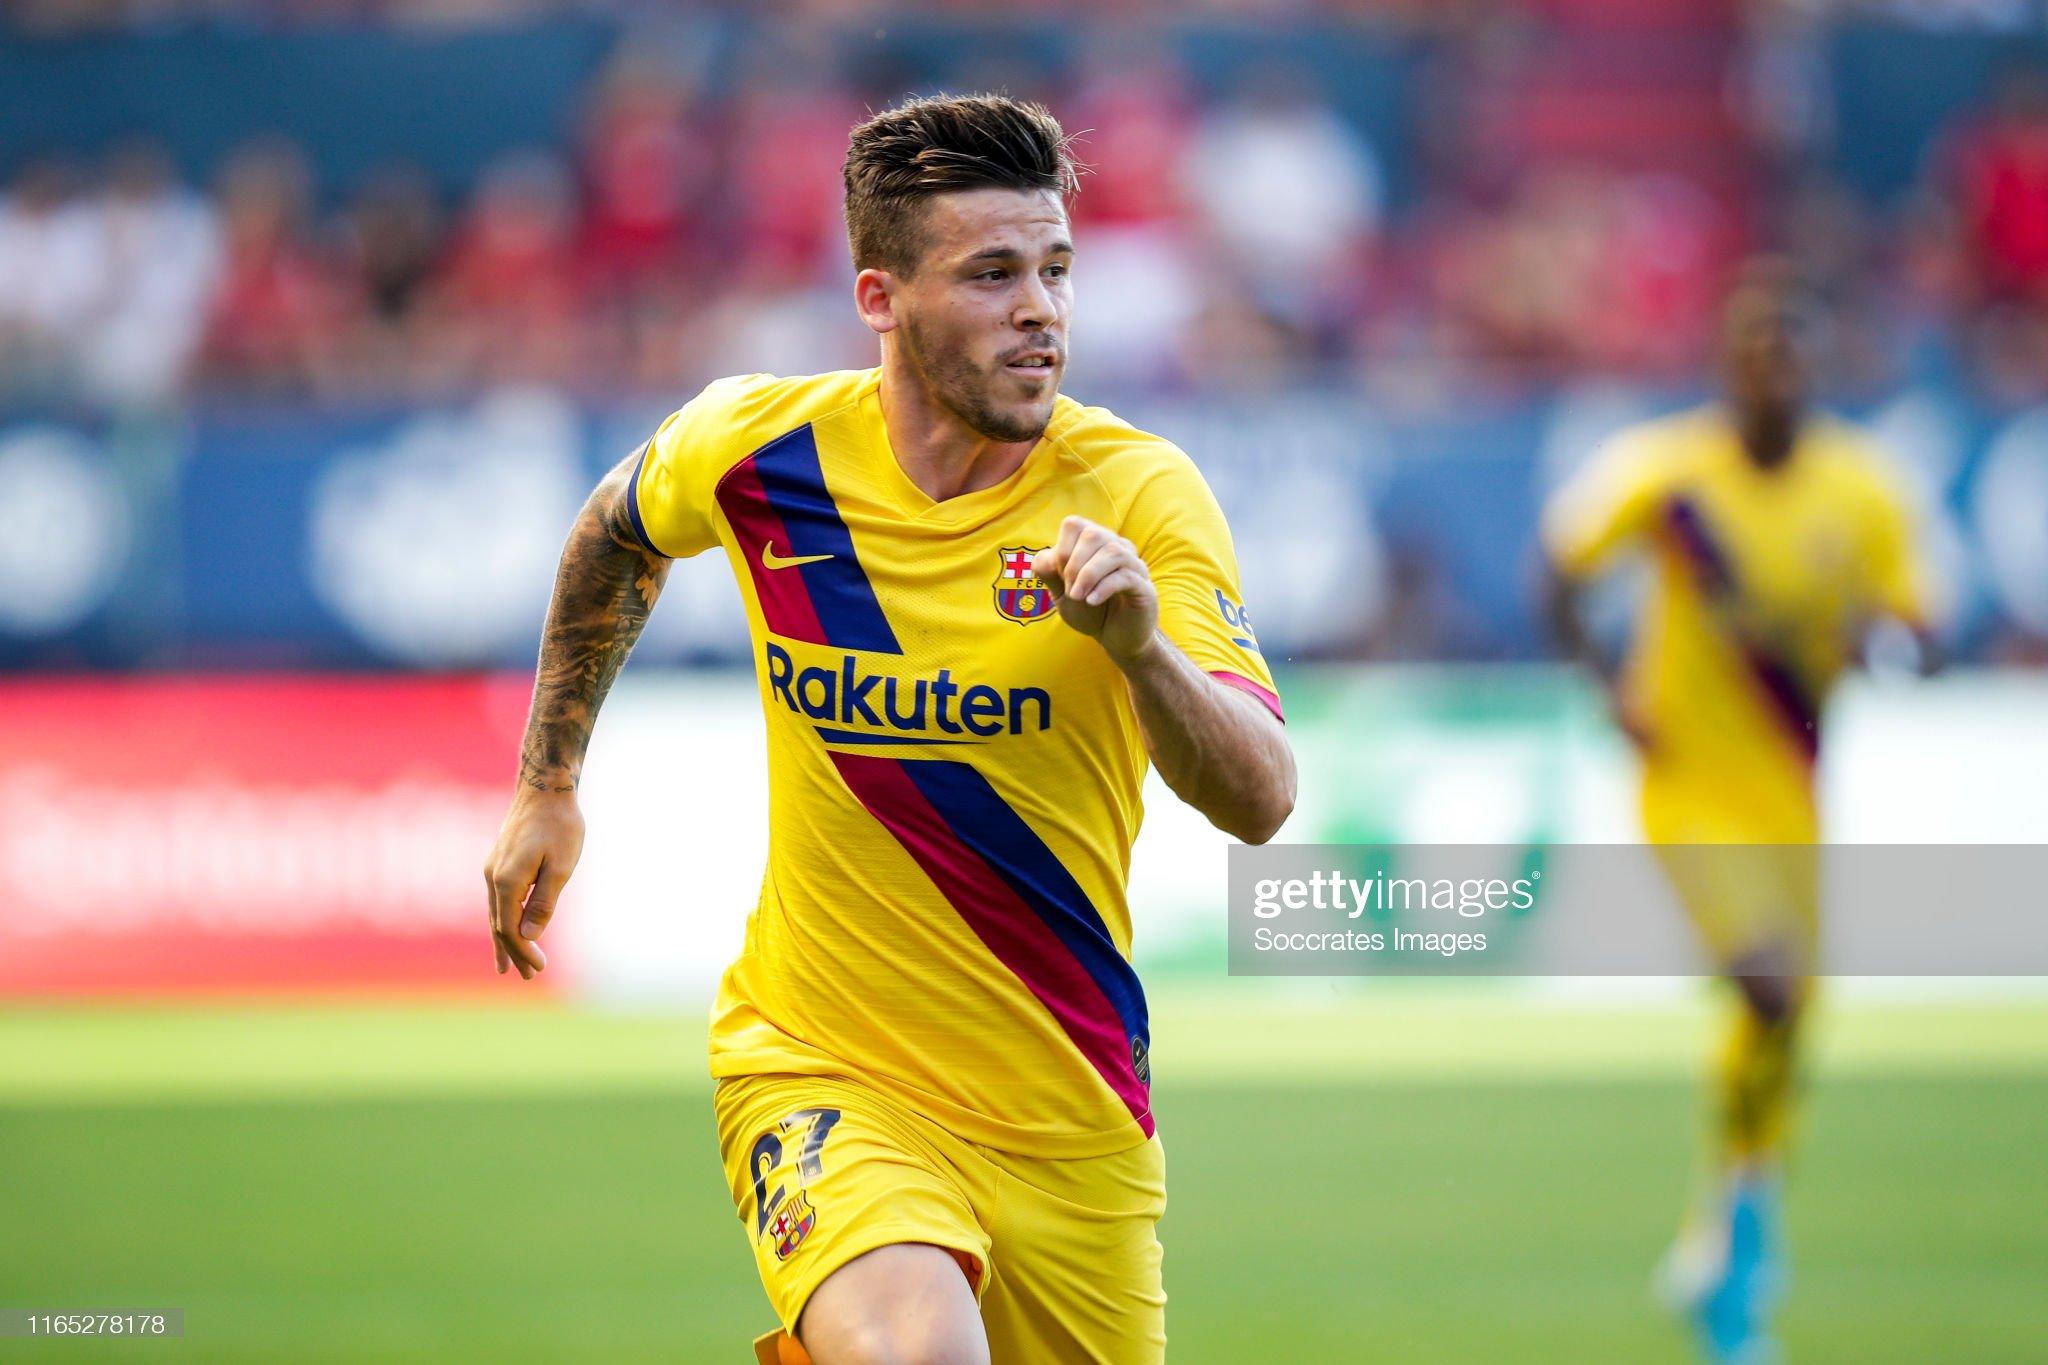 صور مباراة : أوساسونا - برشلونة 2-2 ( 31-08-2019 )  Carles-perez-of-fc-barcelona-during-the-la-liga-santander-match-v-picture-id1165278178?s=2048x2048